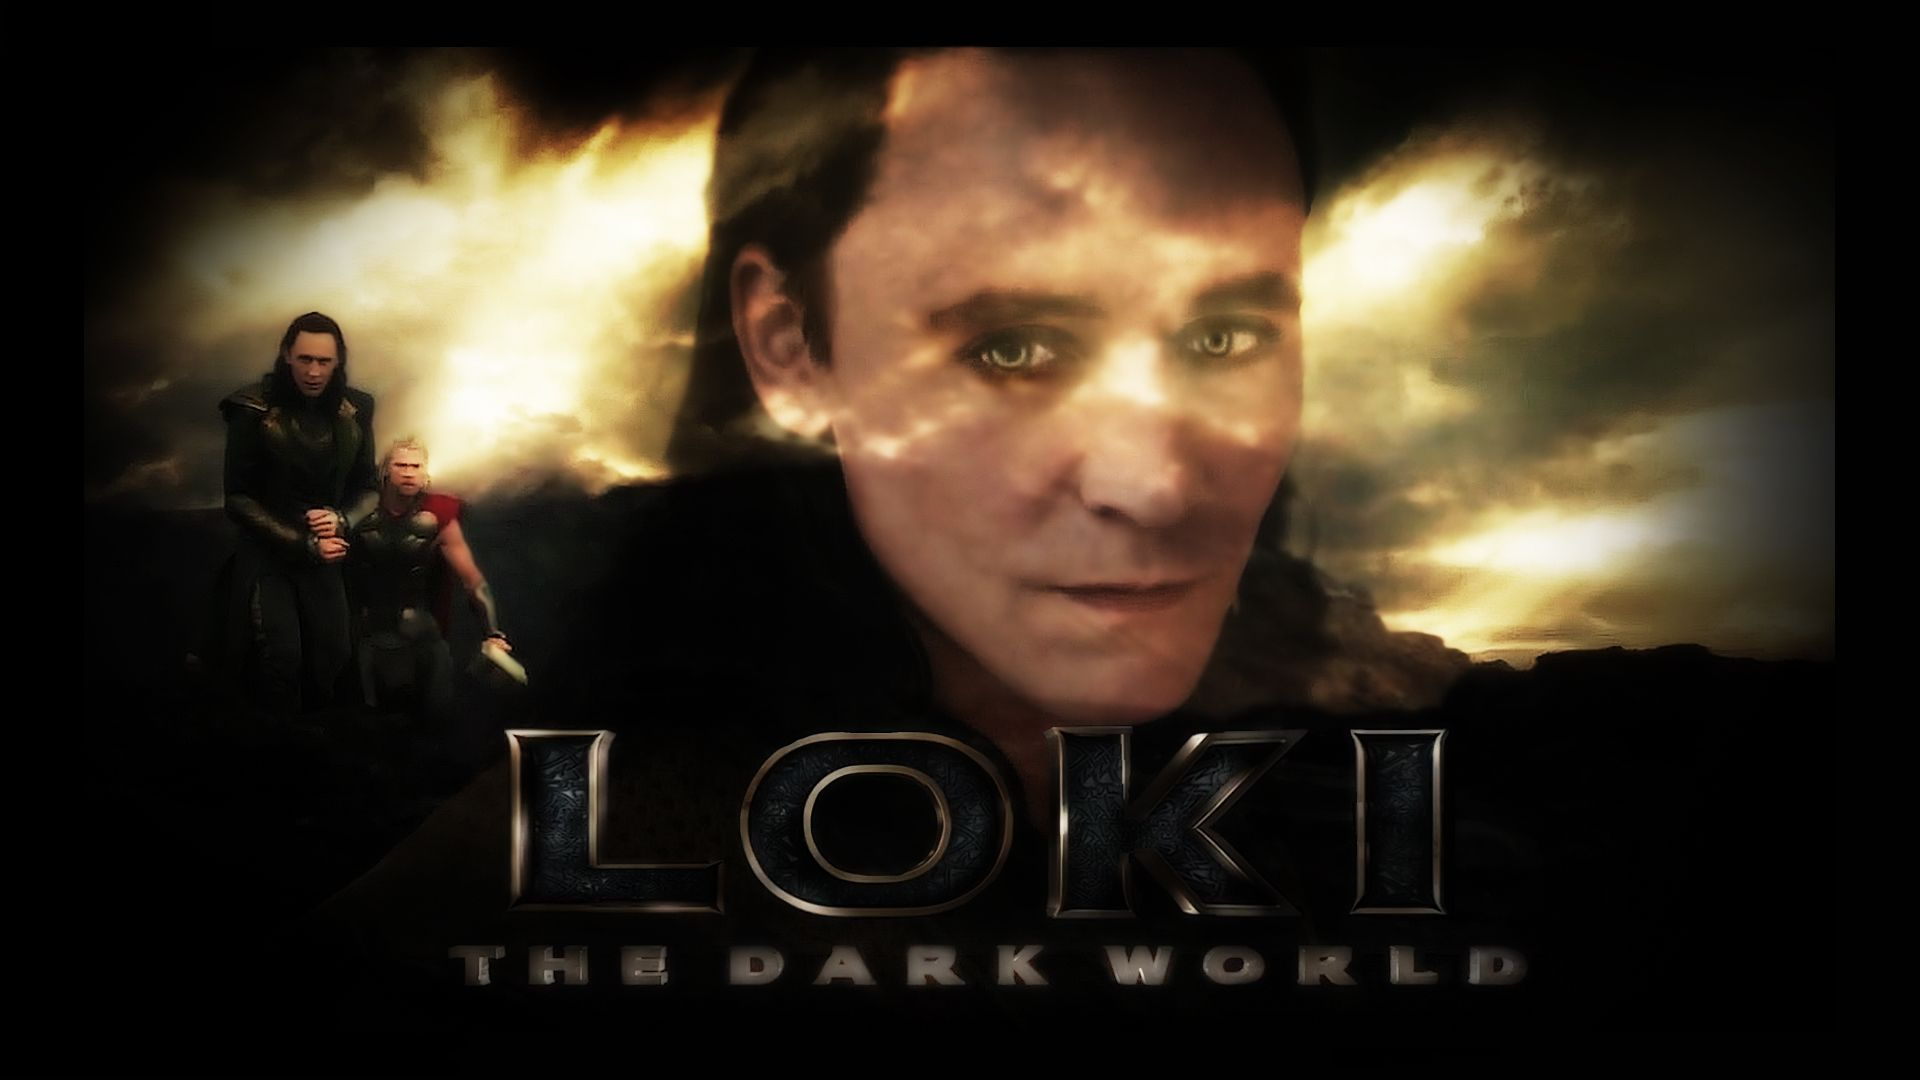 Thor And Loki Wallpaper Hd